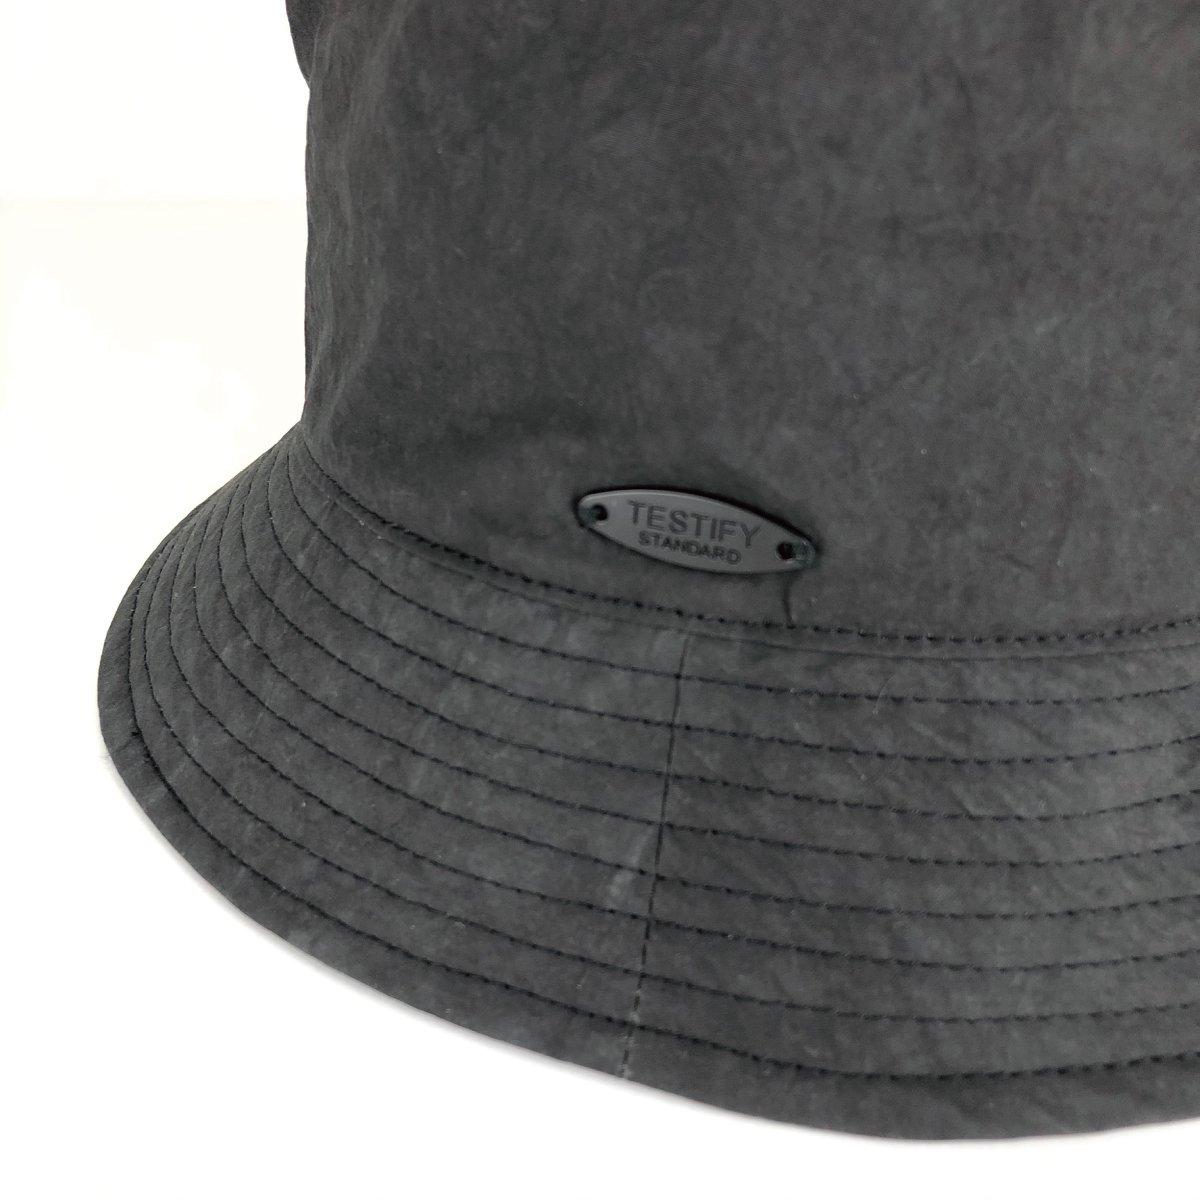 Dyeing Hat 詳細画像7